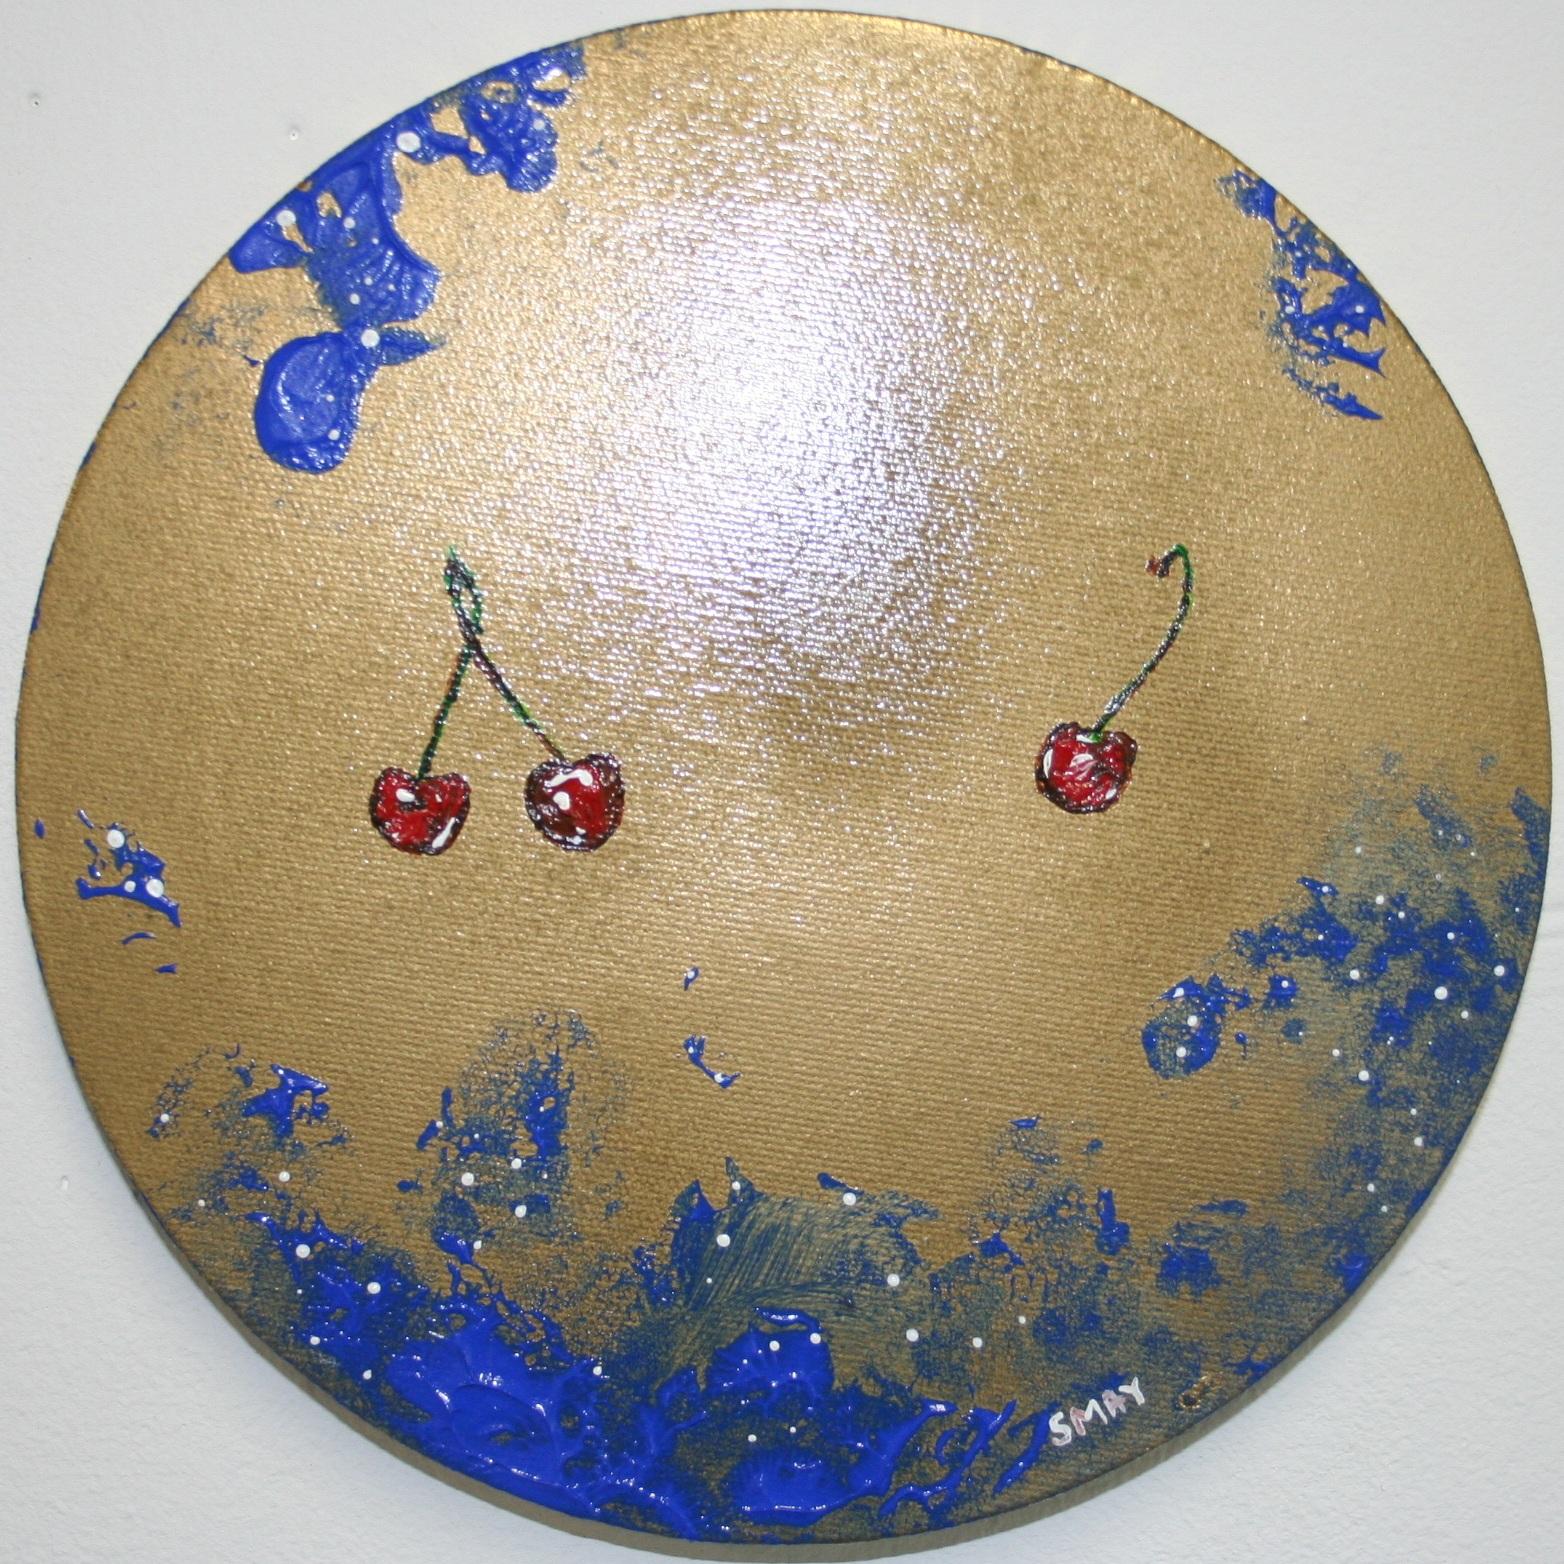 Uncheerful cherry  2012 Mixed media on canvas 20cm diameter